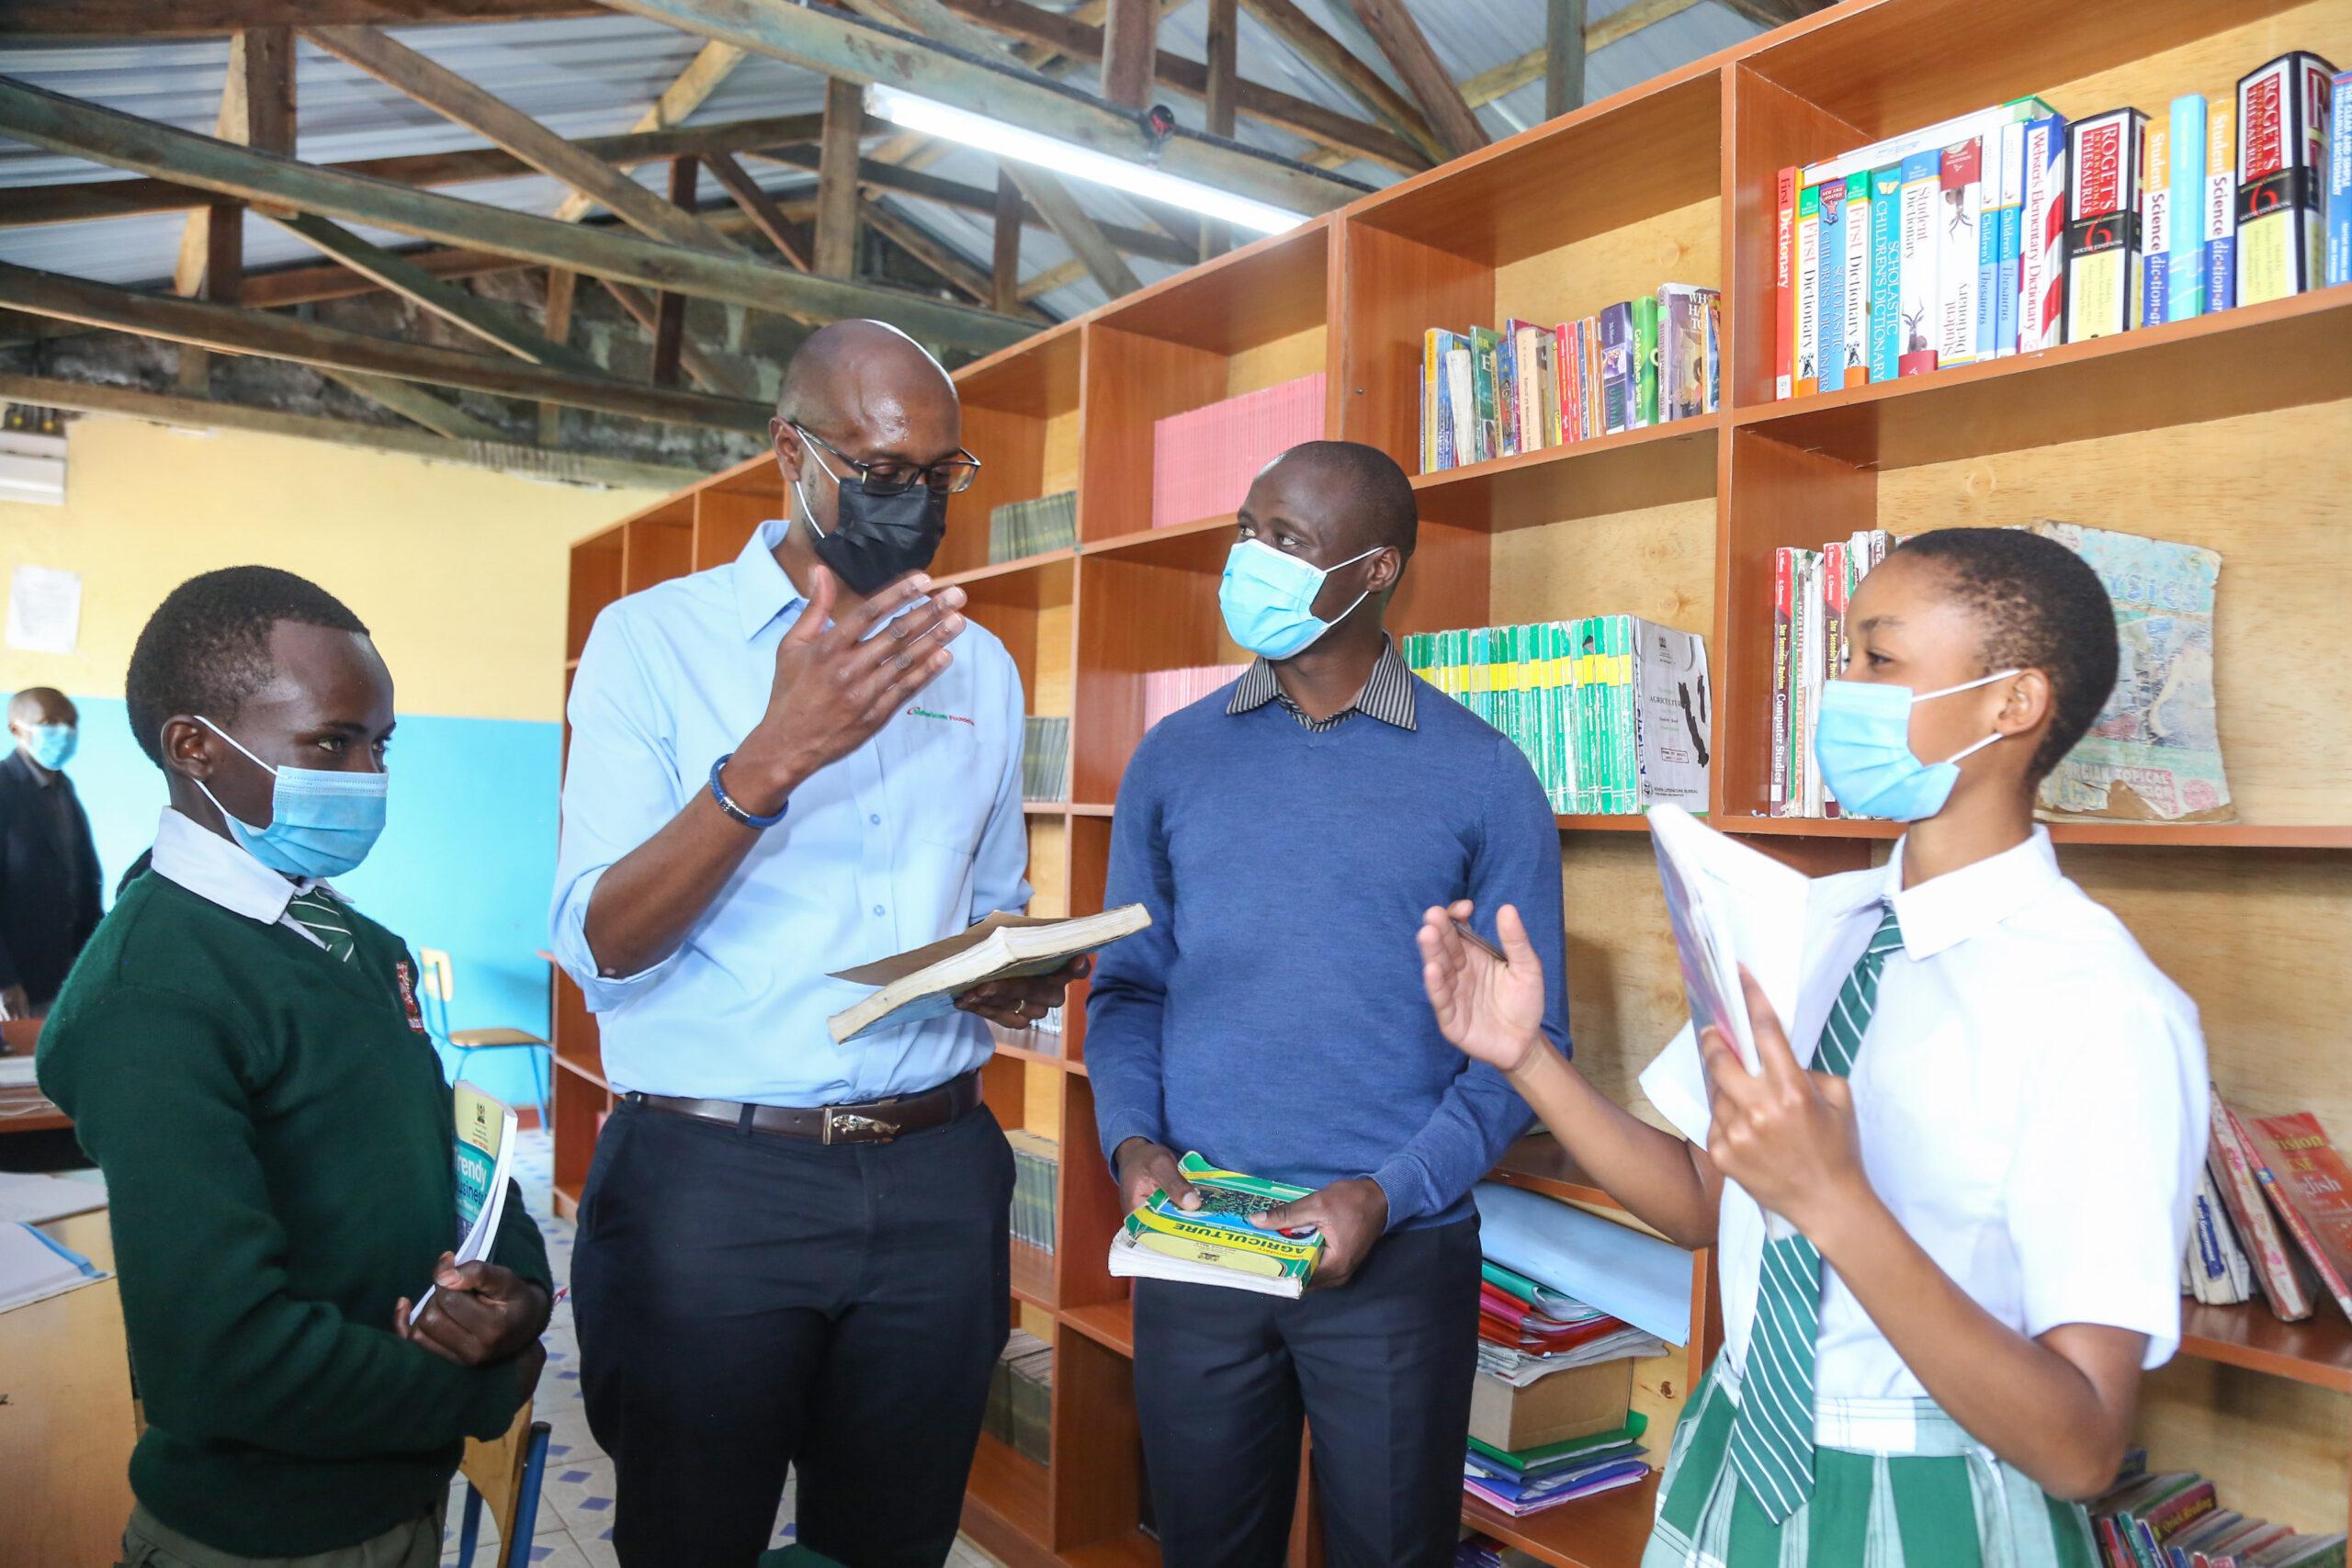 Safaricom Partners with World's Best Teacher to Equip Nakuru School